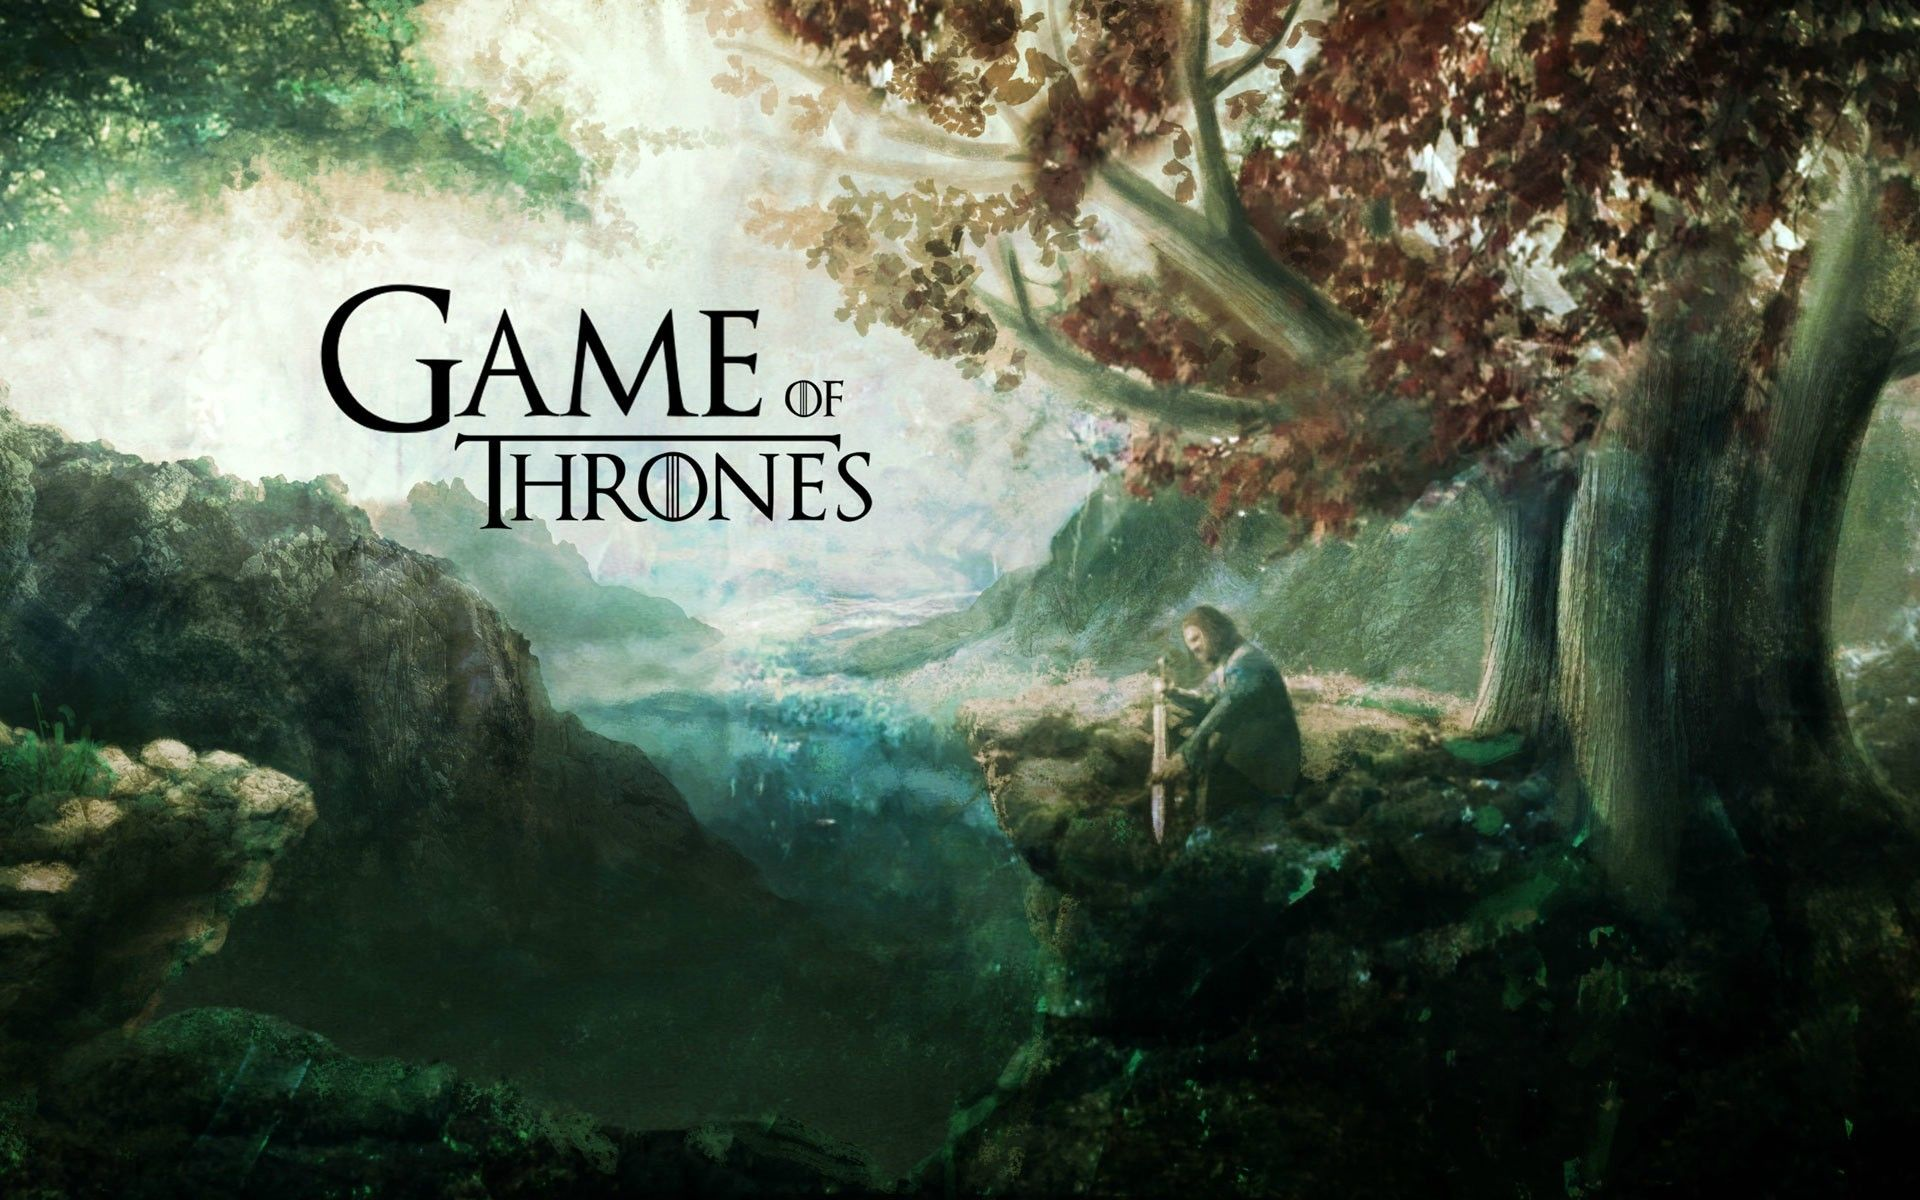 Game Of Thrones Game Of Thrones Poster Game Of Thrones Tv Watch Game Of Thrones